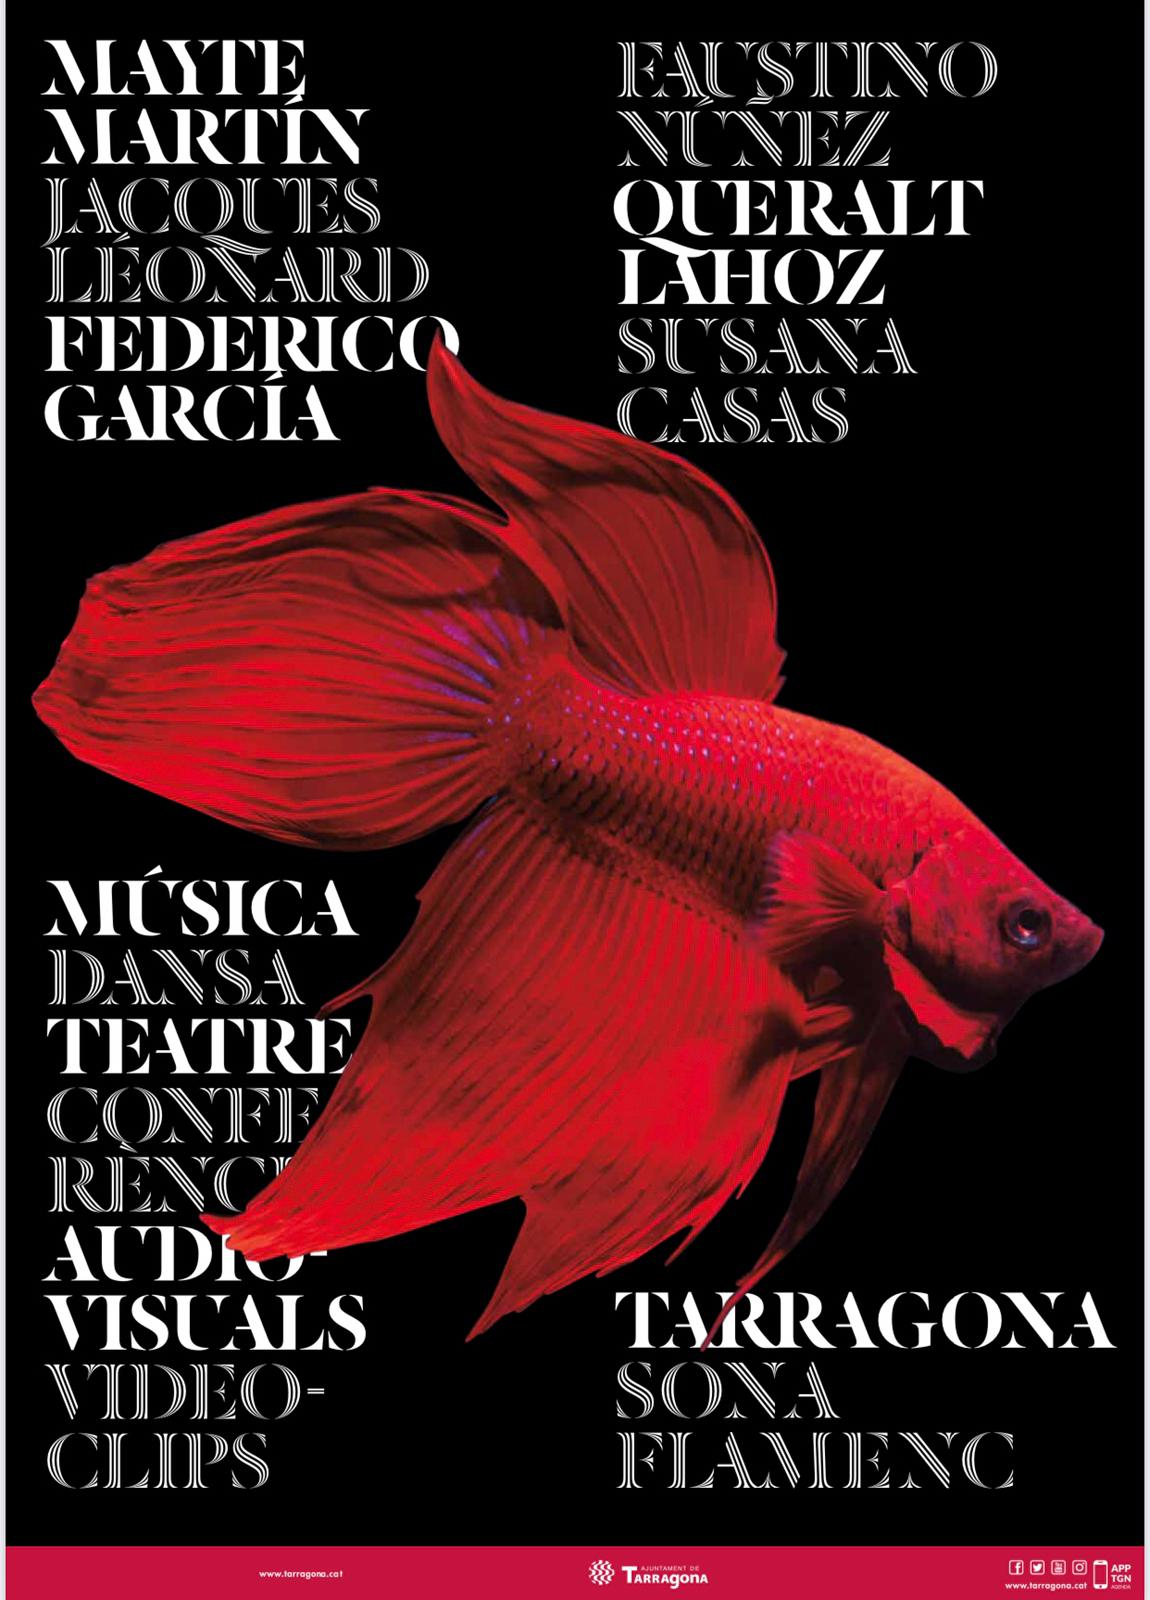 Sona Flamenc 2021